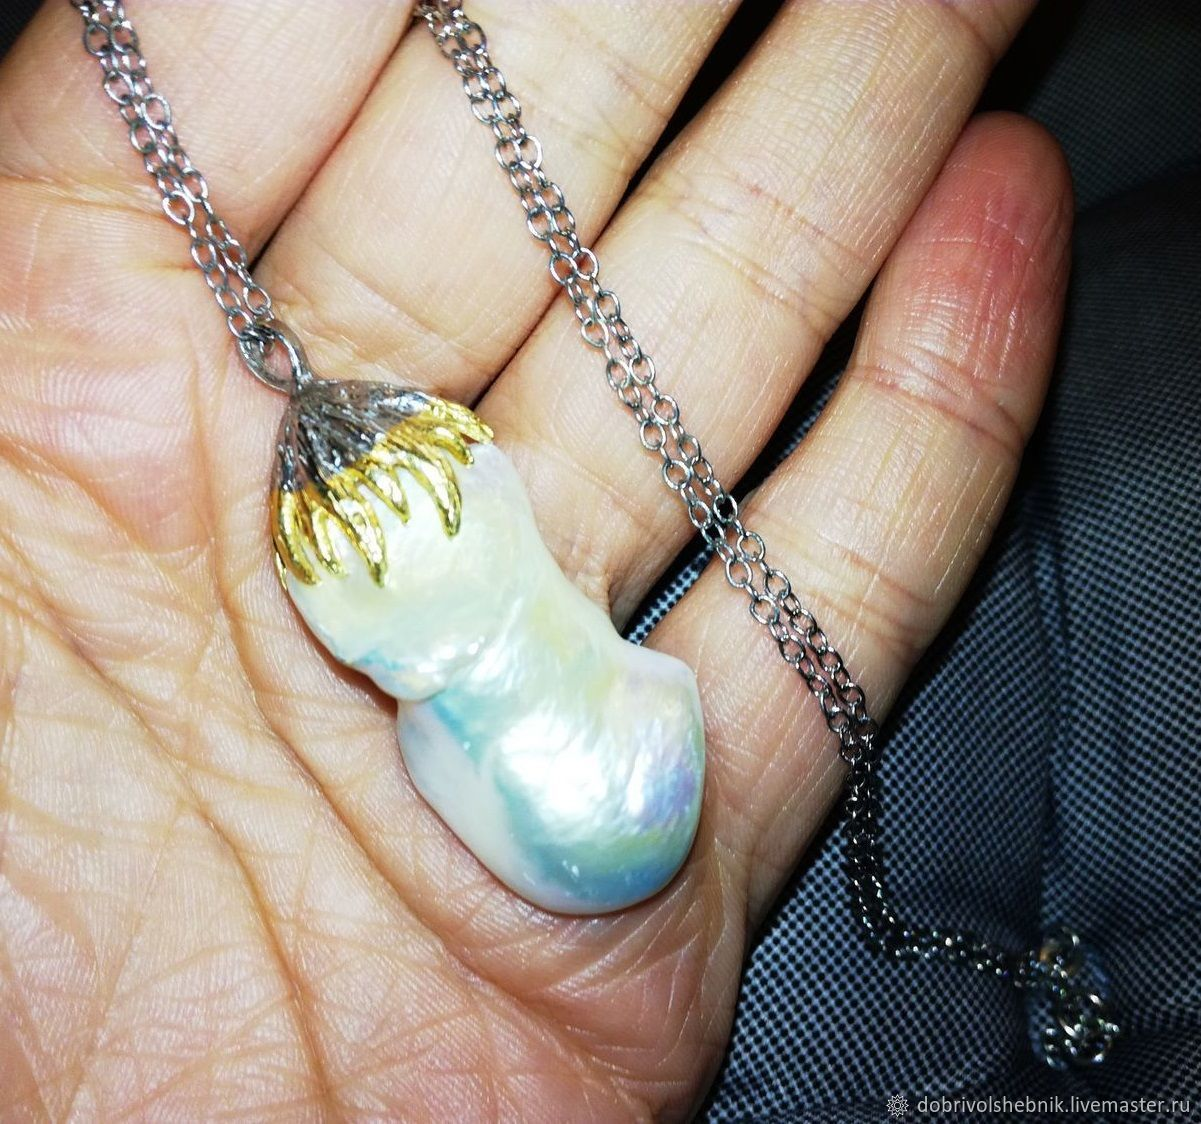 Sirena pendant with large natural pearls, Pendants, Novaya Usman,  Фото №1